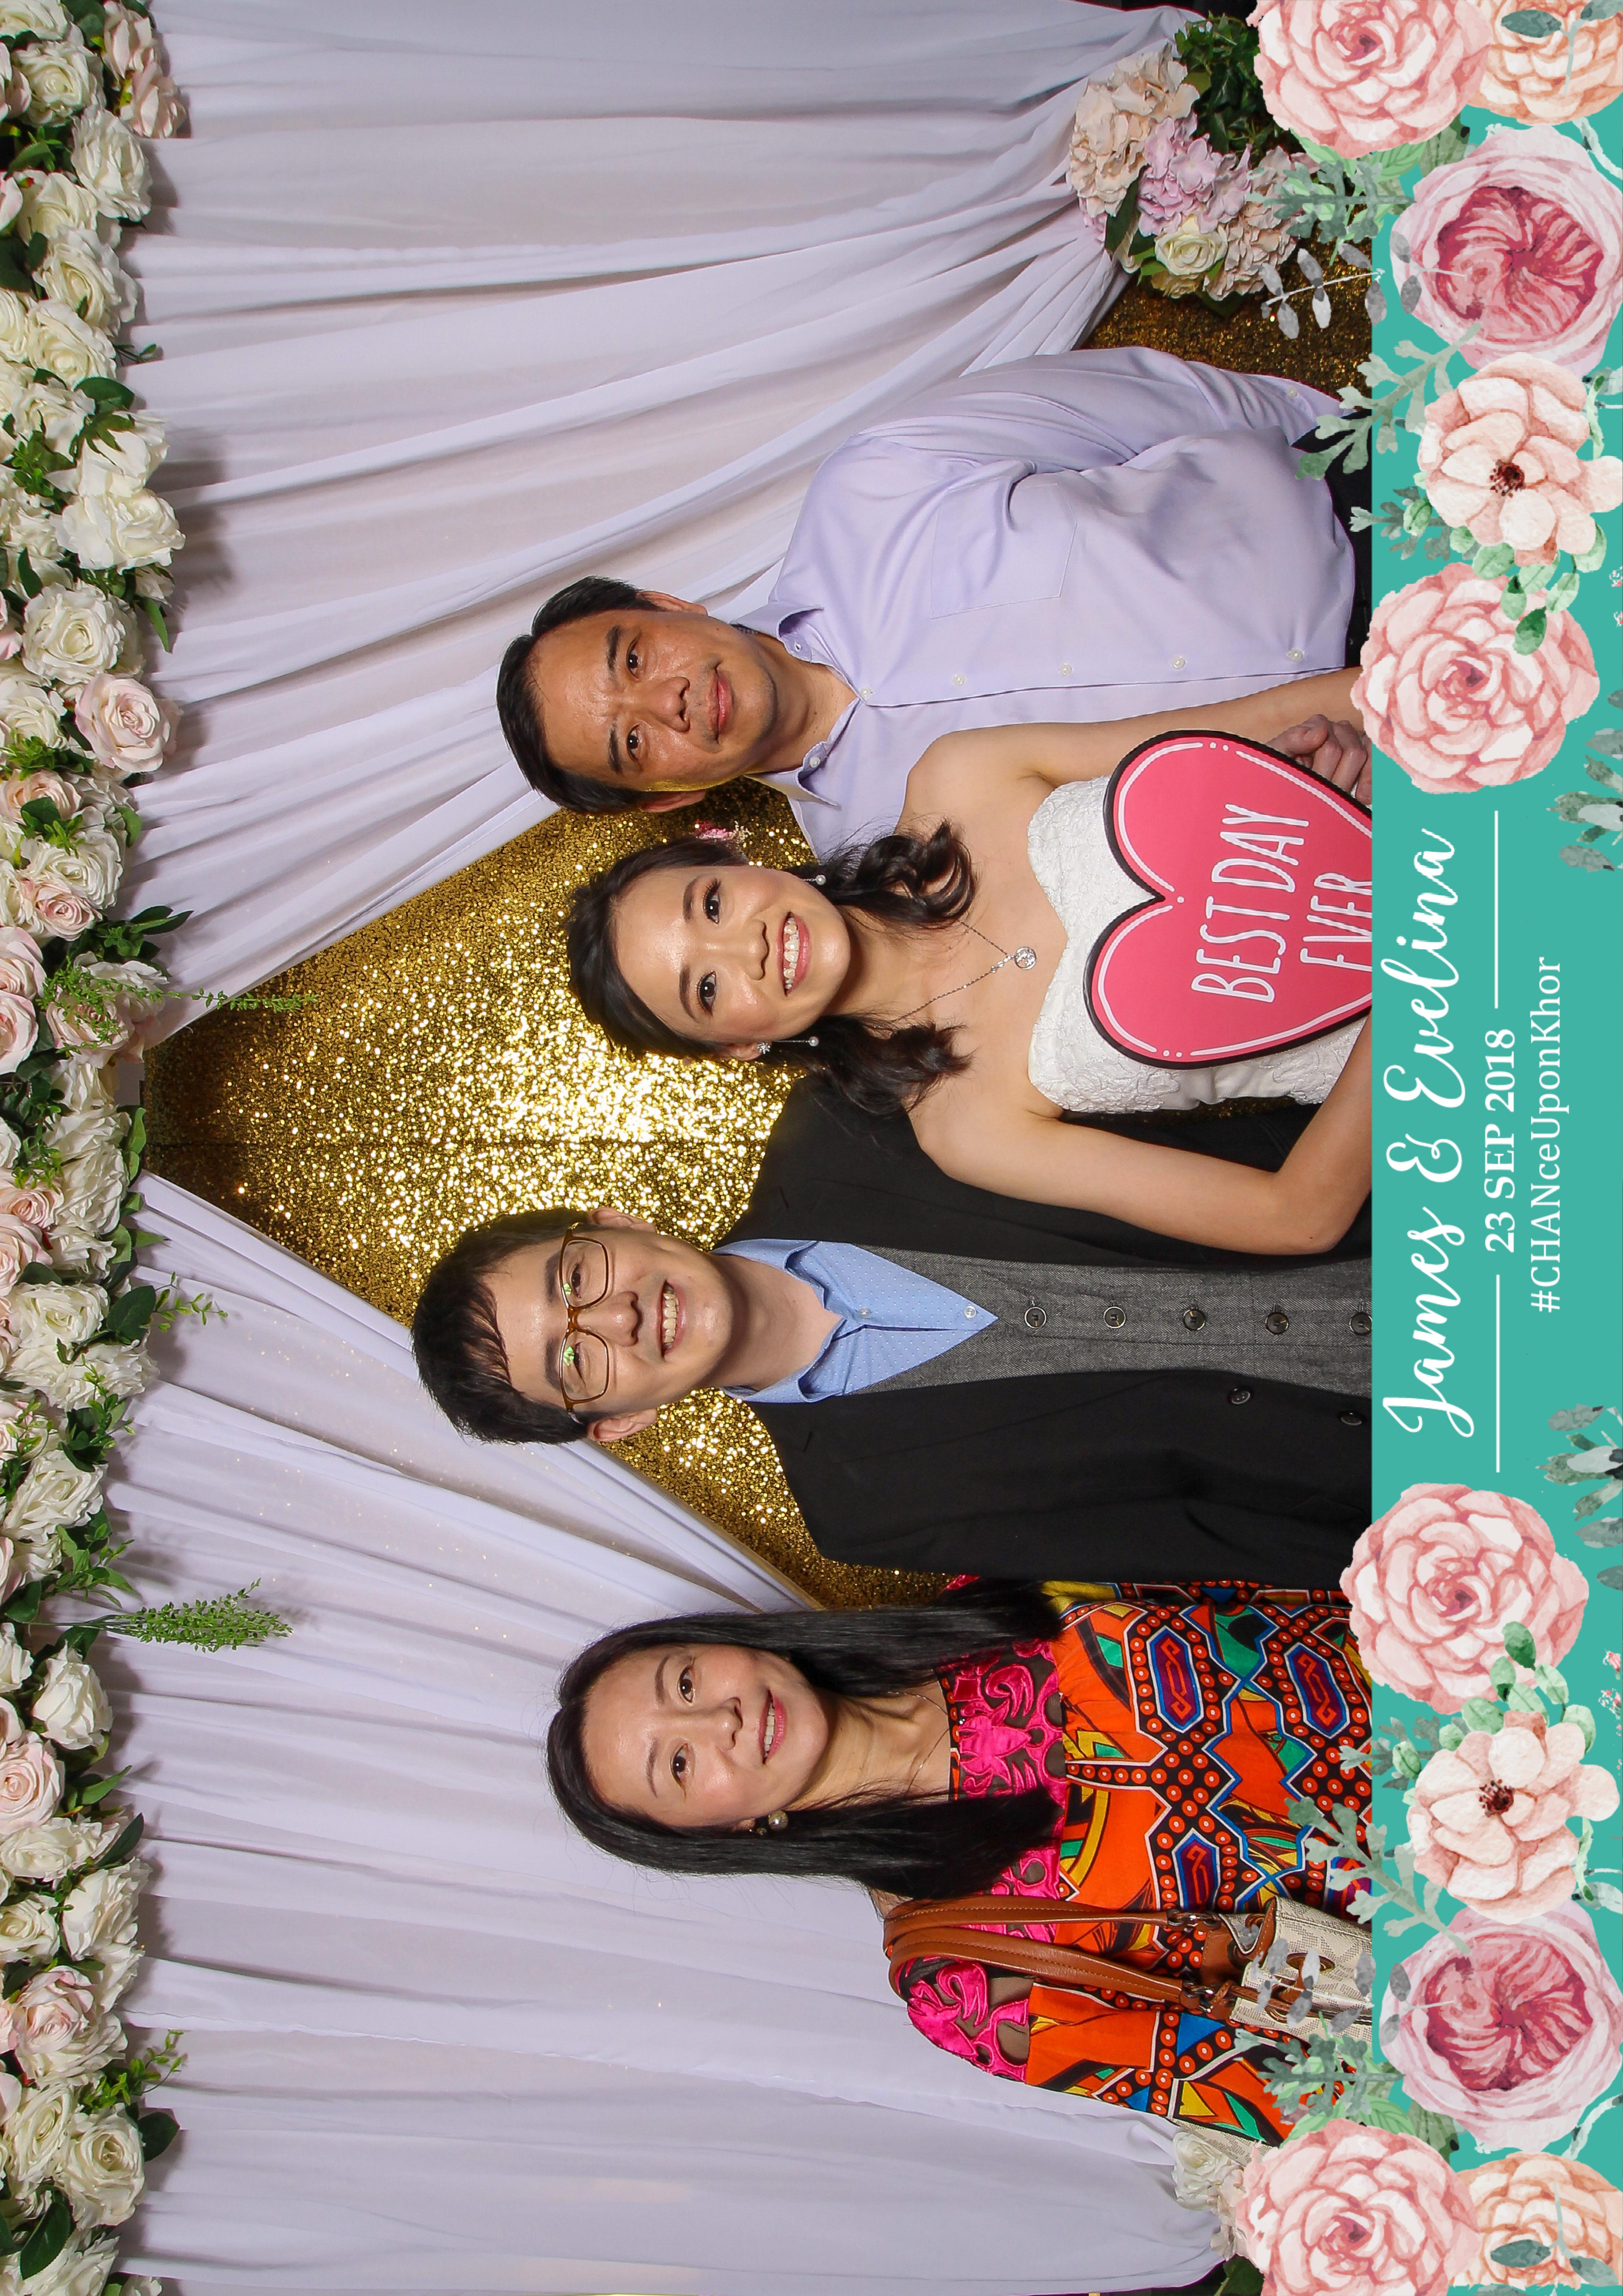 wedding photo booth singapore-4